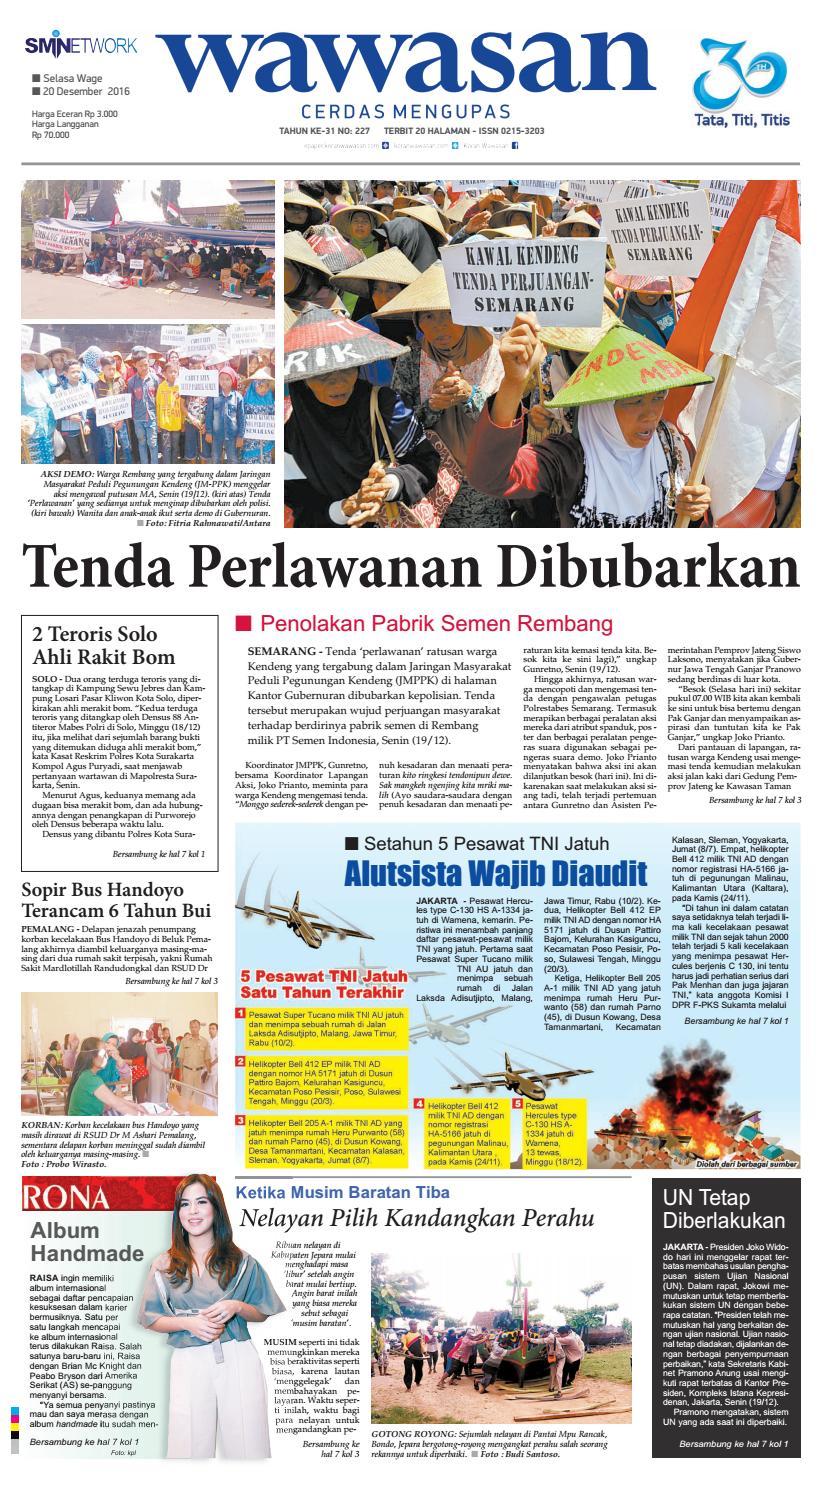 Wawasan 20 Desember 2016 By Koran Pagi Issuu Produk Ukm Bumn Tempat Tisu Handmade Trenggalek